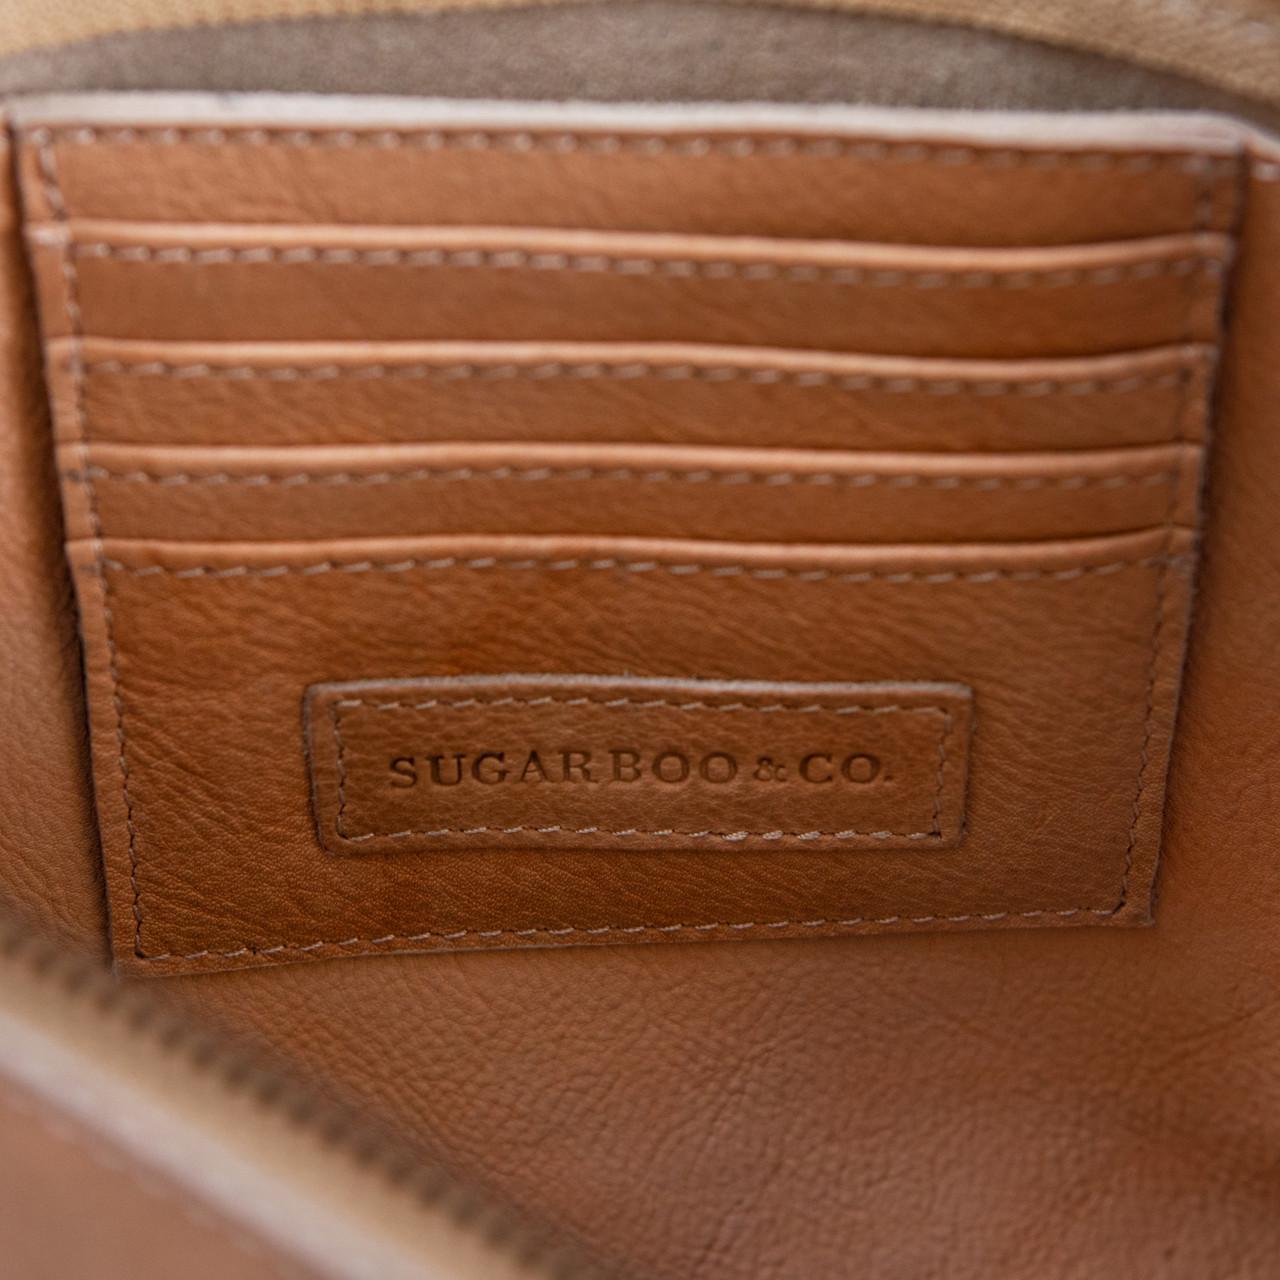 blush leather zip clutch inside card holder